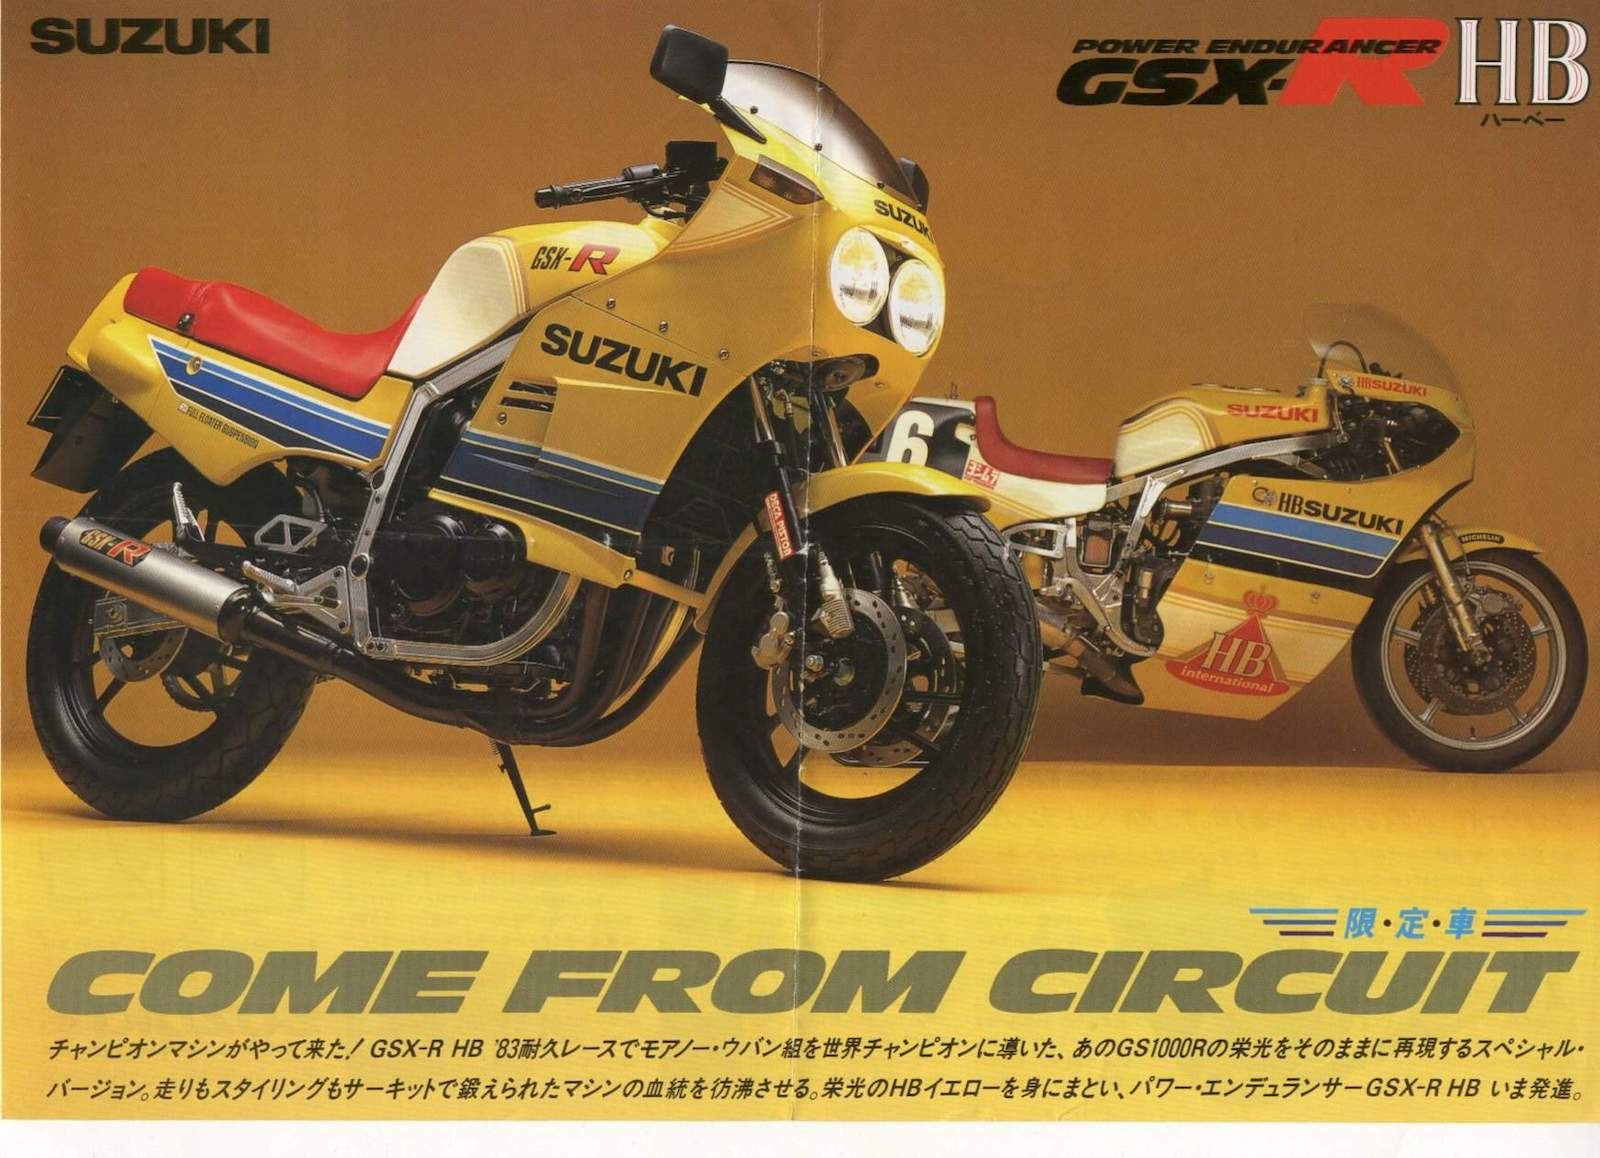 GSX-R history